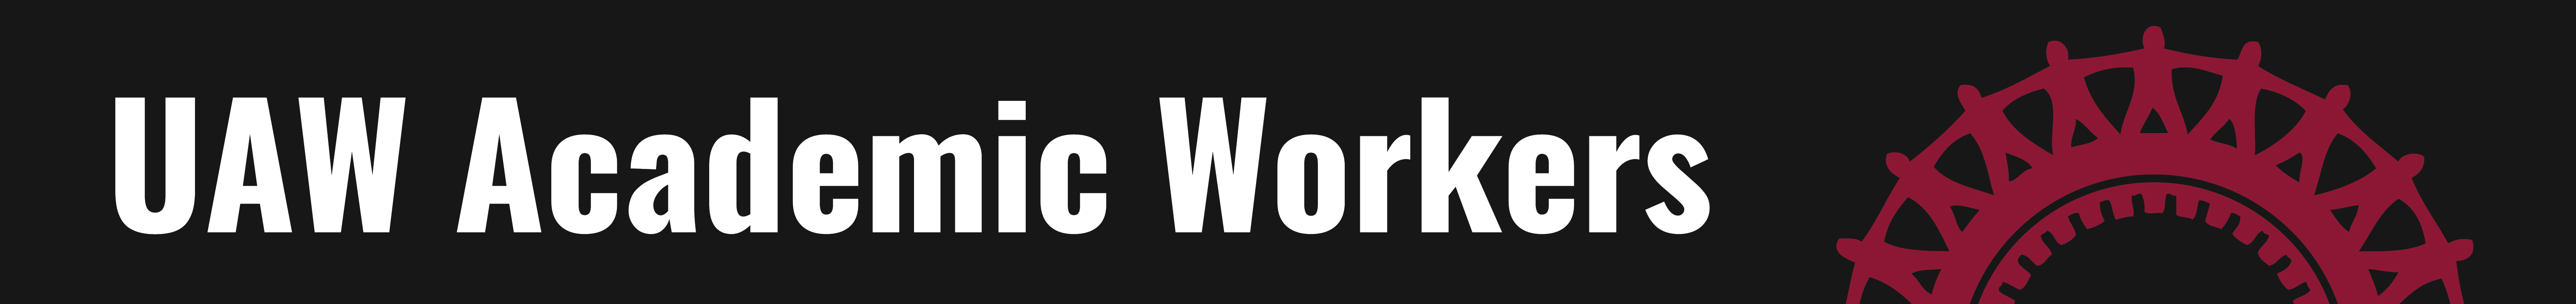 Opt_action_network_header-07